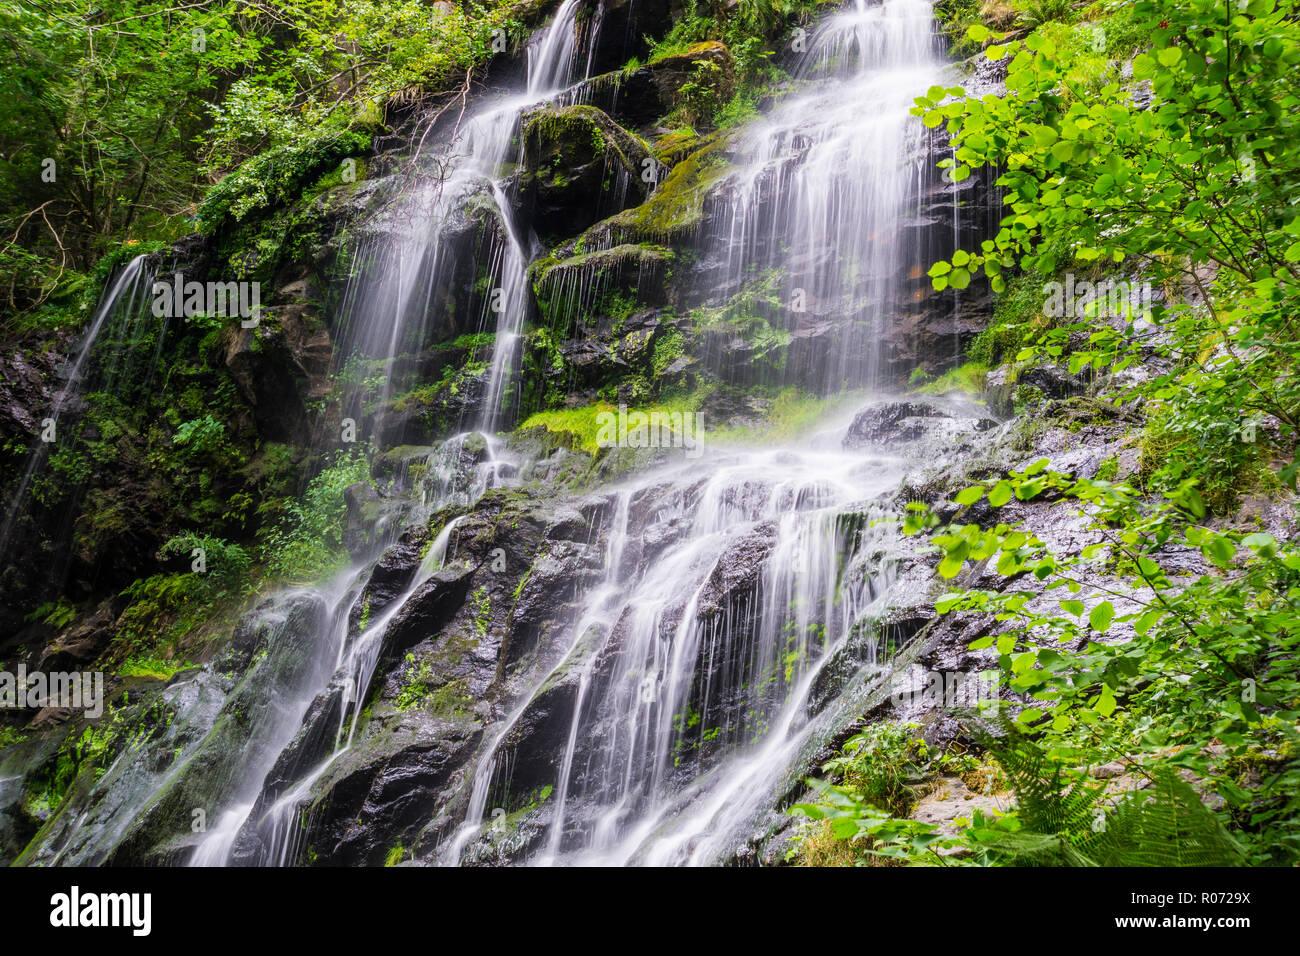 Germany, Zweribach waterfall near Simonswald in mystic black forest atmosphere - Stock Image